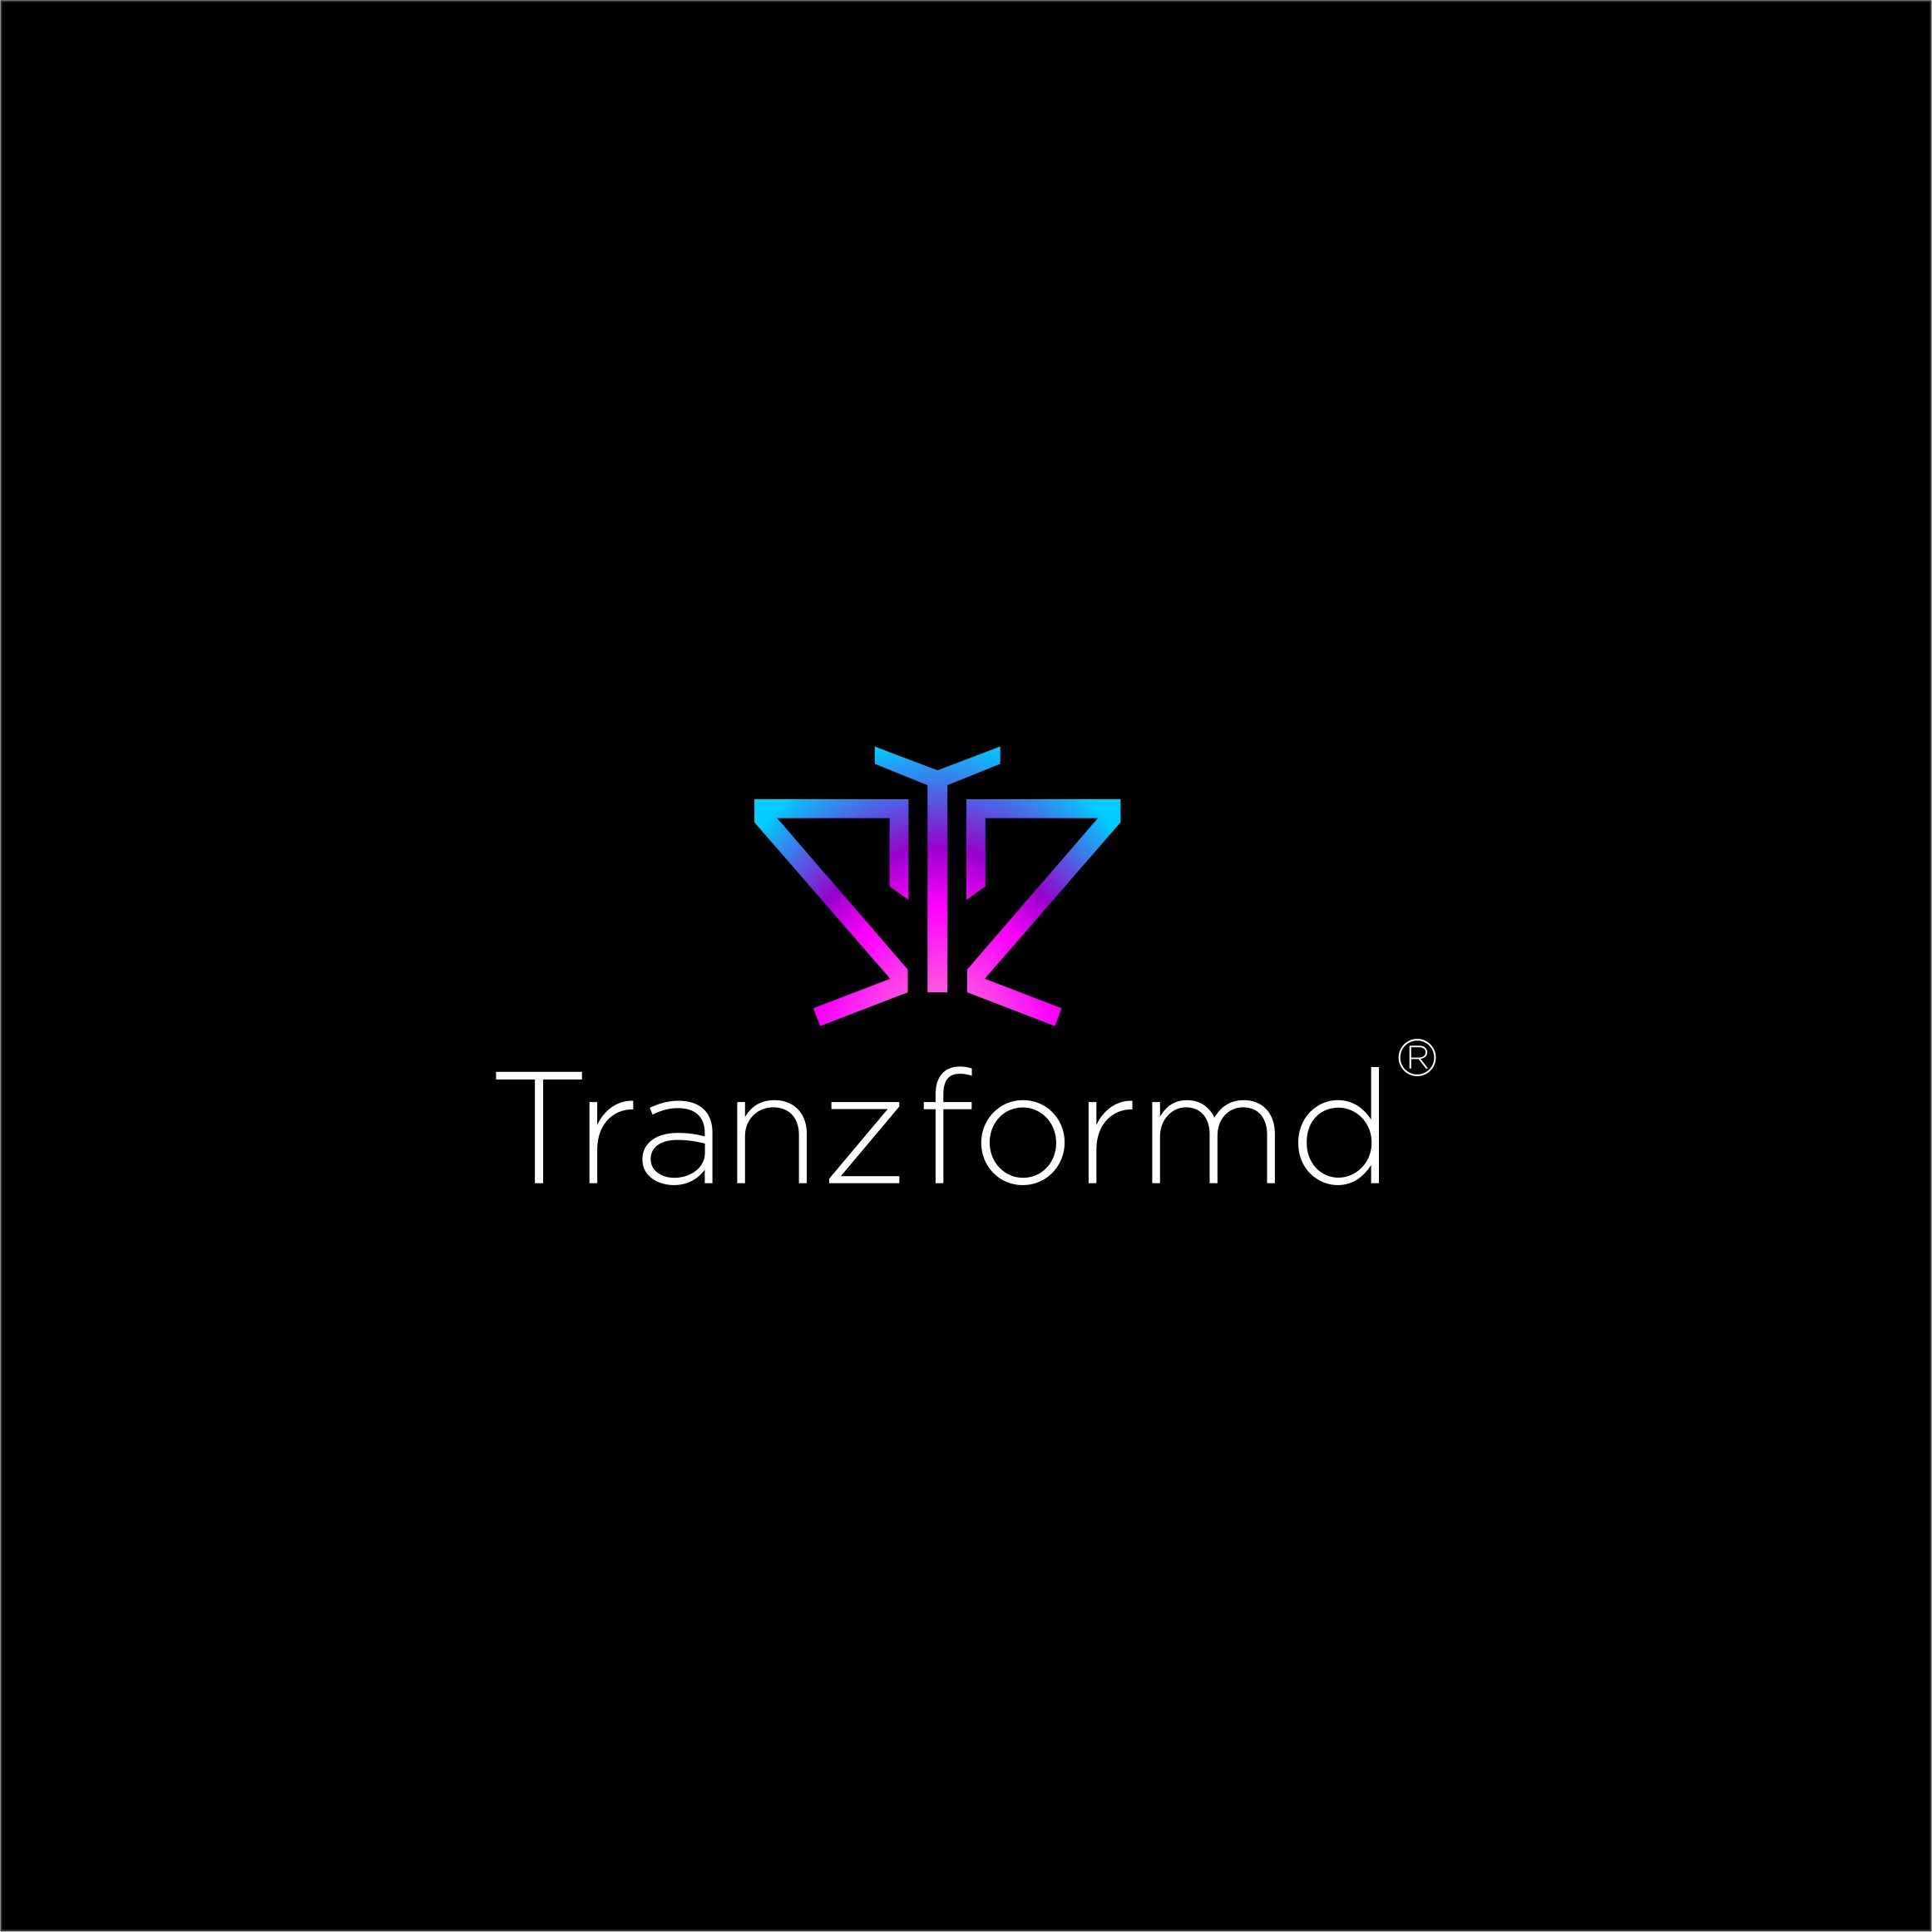 Design a logo for a Tech & Digital Transformation Consultancy